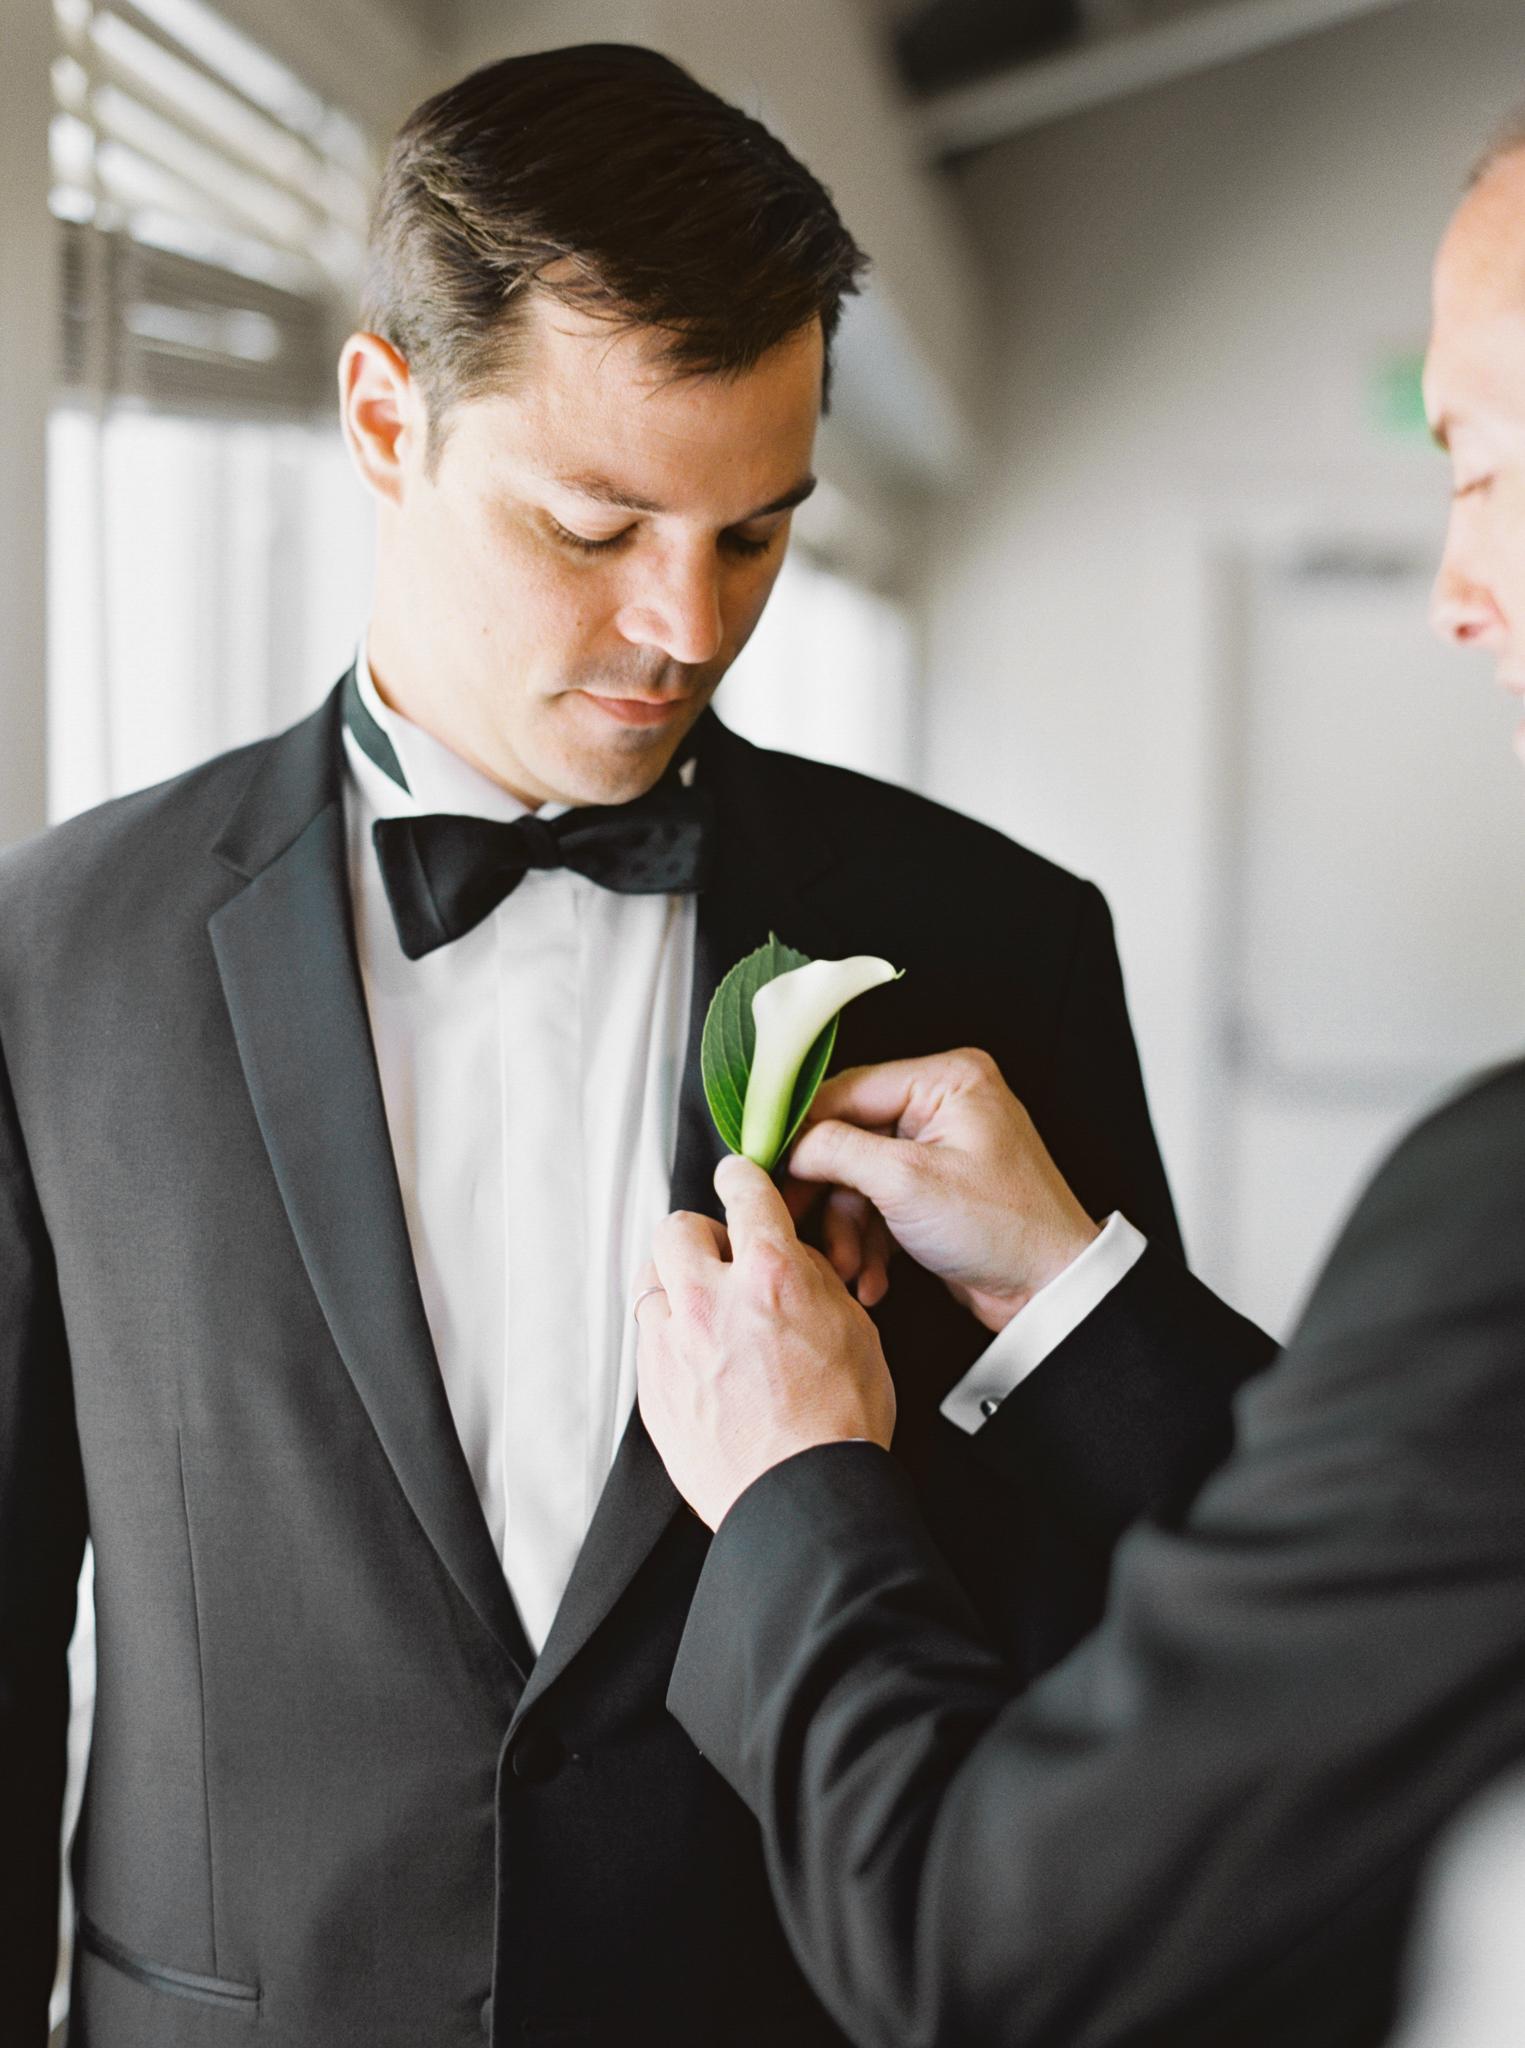 056OutliveCreative_Travel_Photographer_Videographer_Lewis&Clark_Oregon_Elegant_BlackTie_Destination_Wedding.jpg